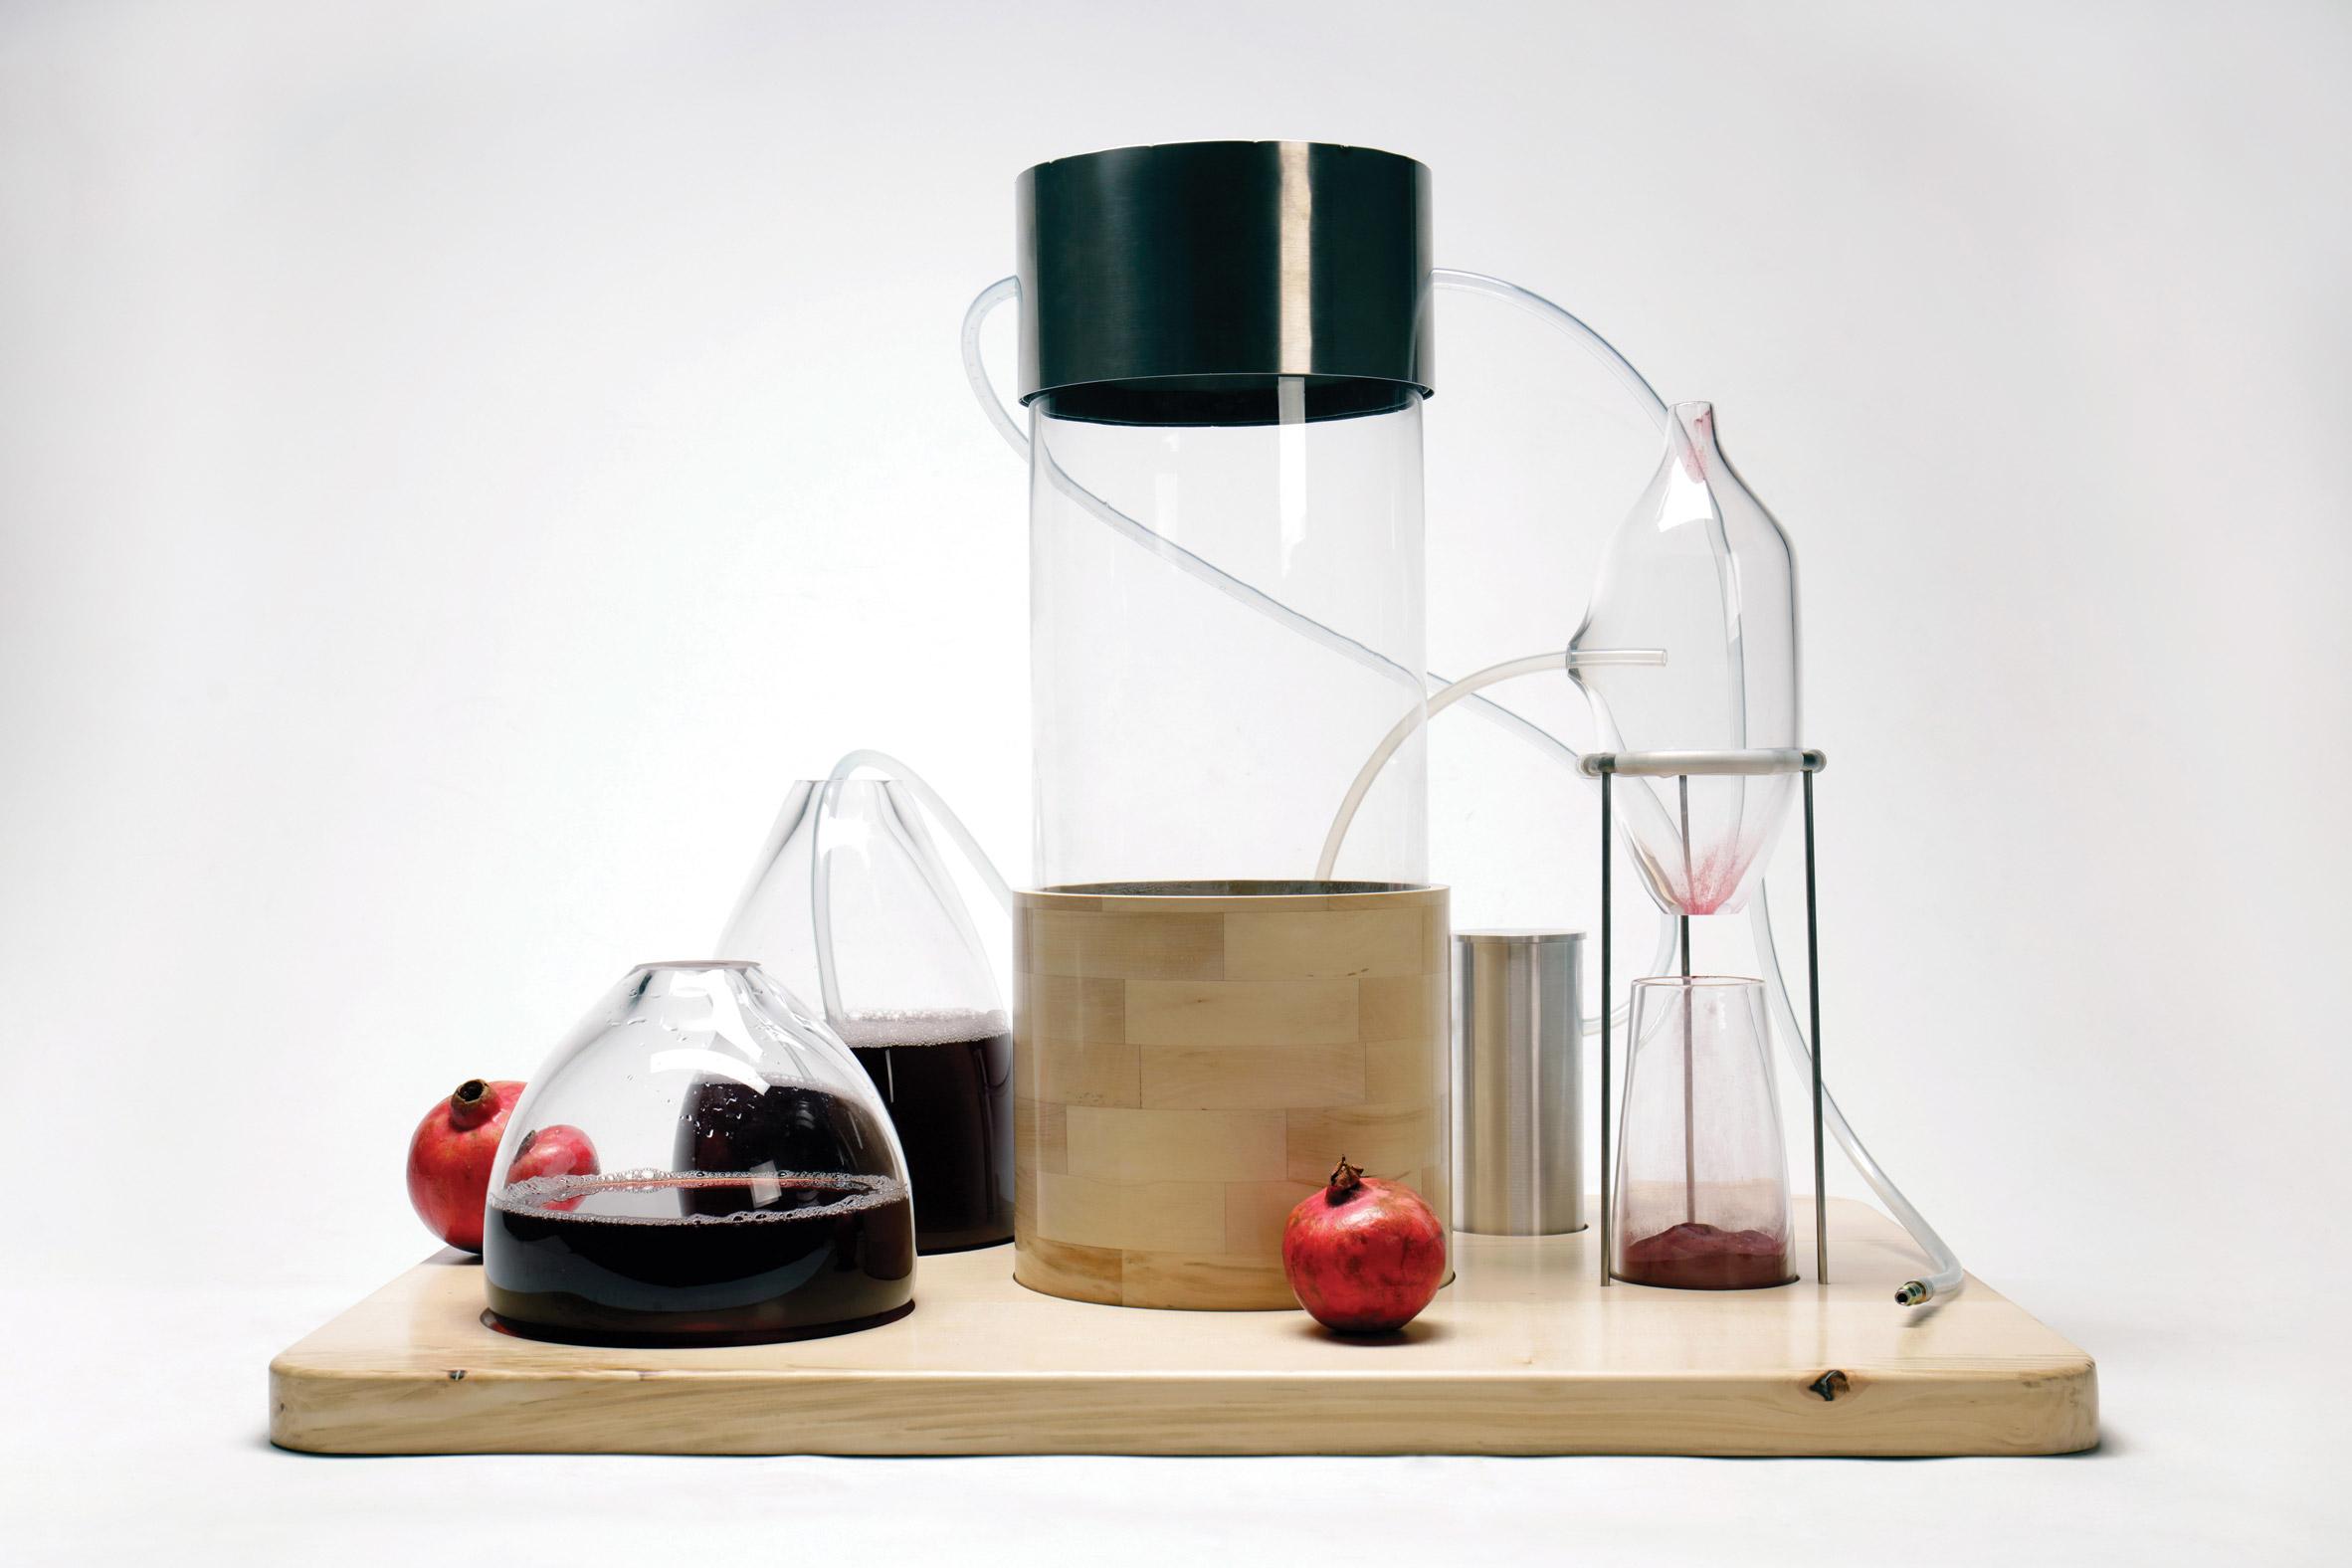 kaiku-nicole-stjernsward-imperial-college-graduate-project-2019-food-waste-vegeatable-skin-pigment_dezeen_2364_col_11.jpg